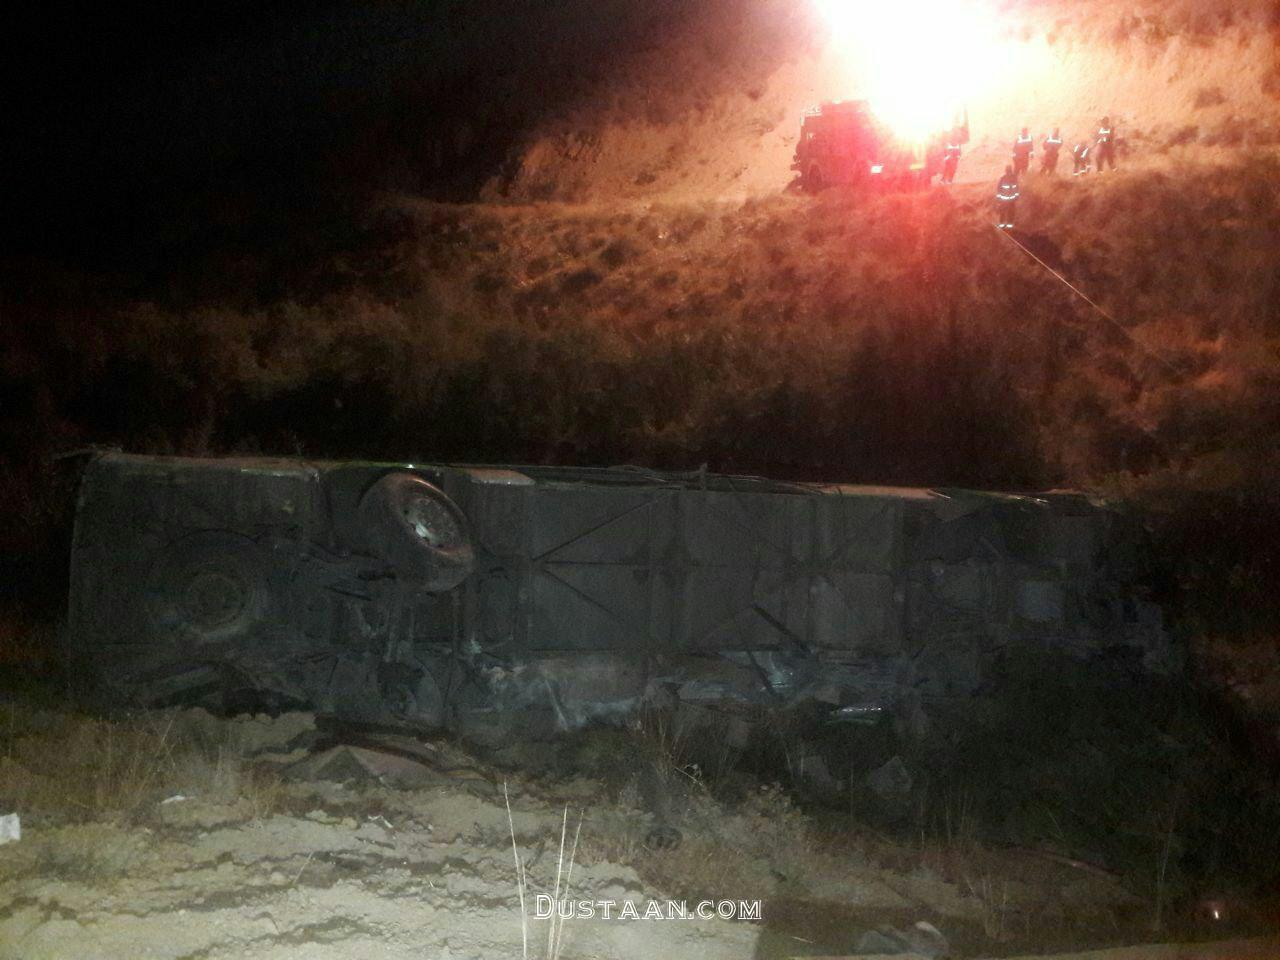 www.dustaan.com سقوط اتوبوس به دره در جاجرود؛  ۱۱ کشته و ۲۶ مصدوم برجا گذاشت +عکس